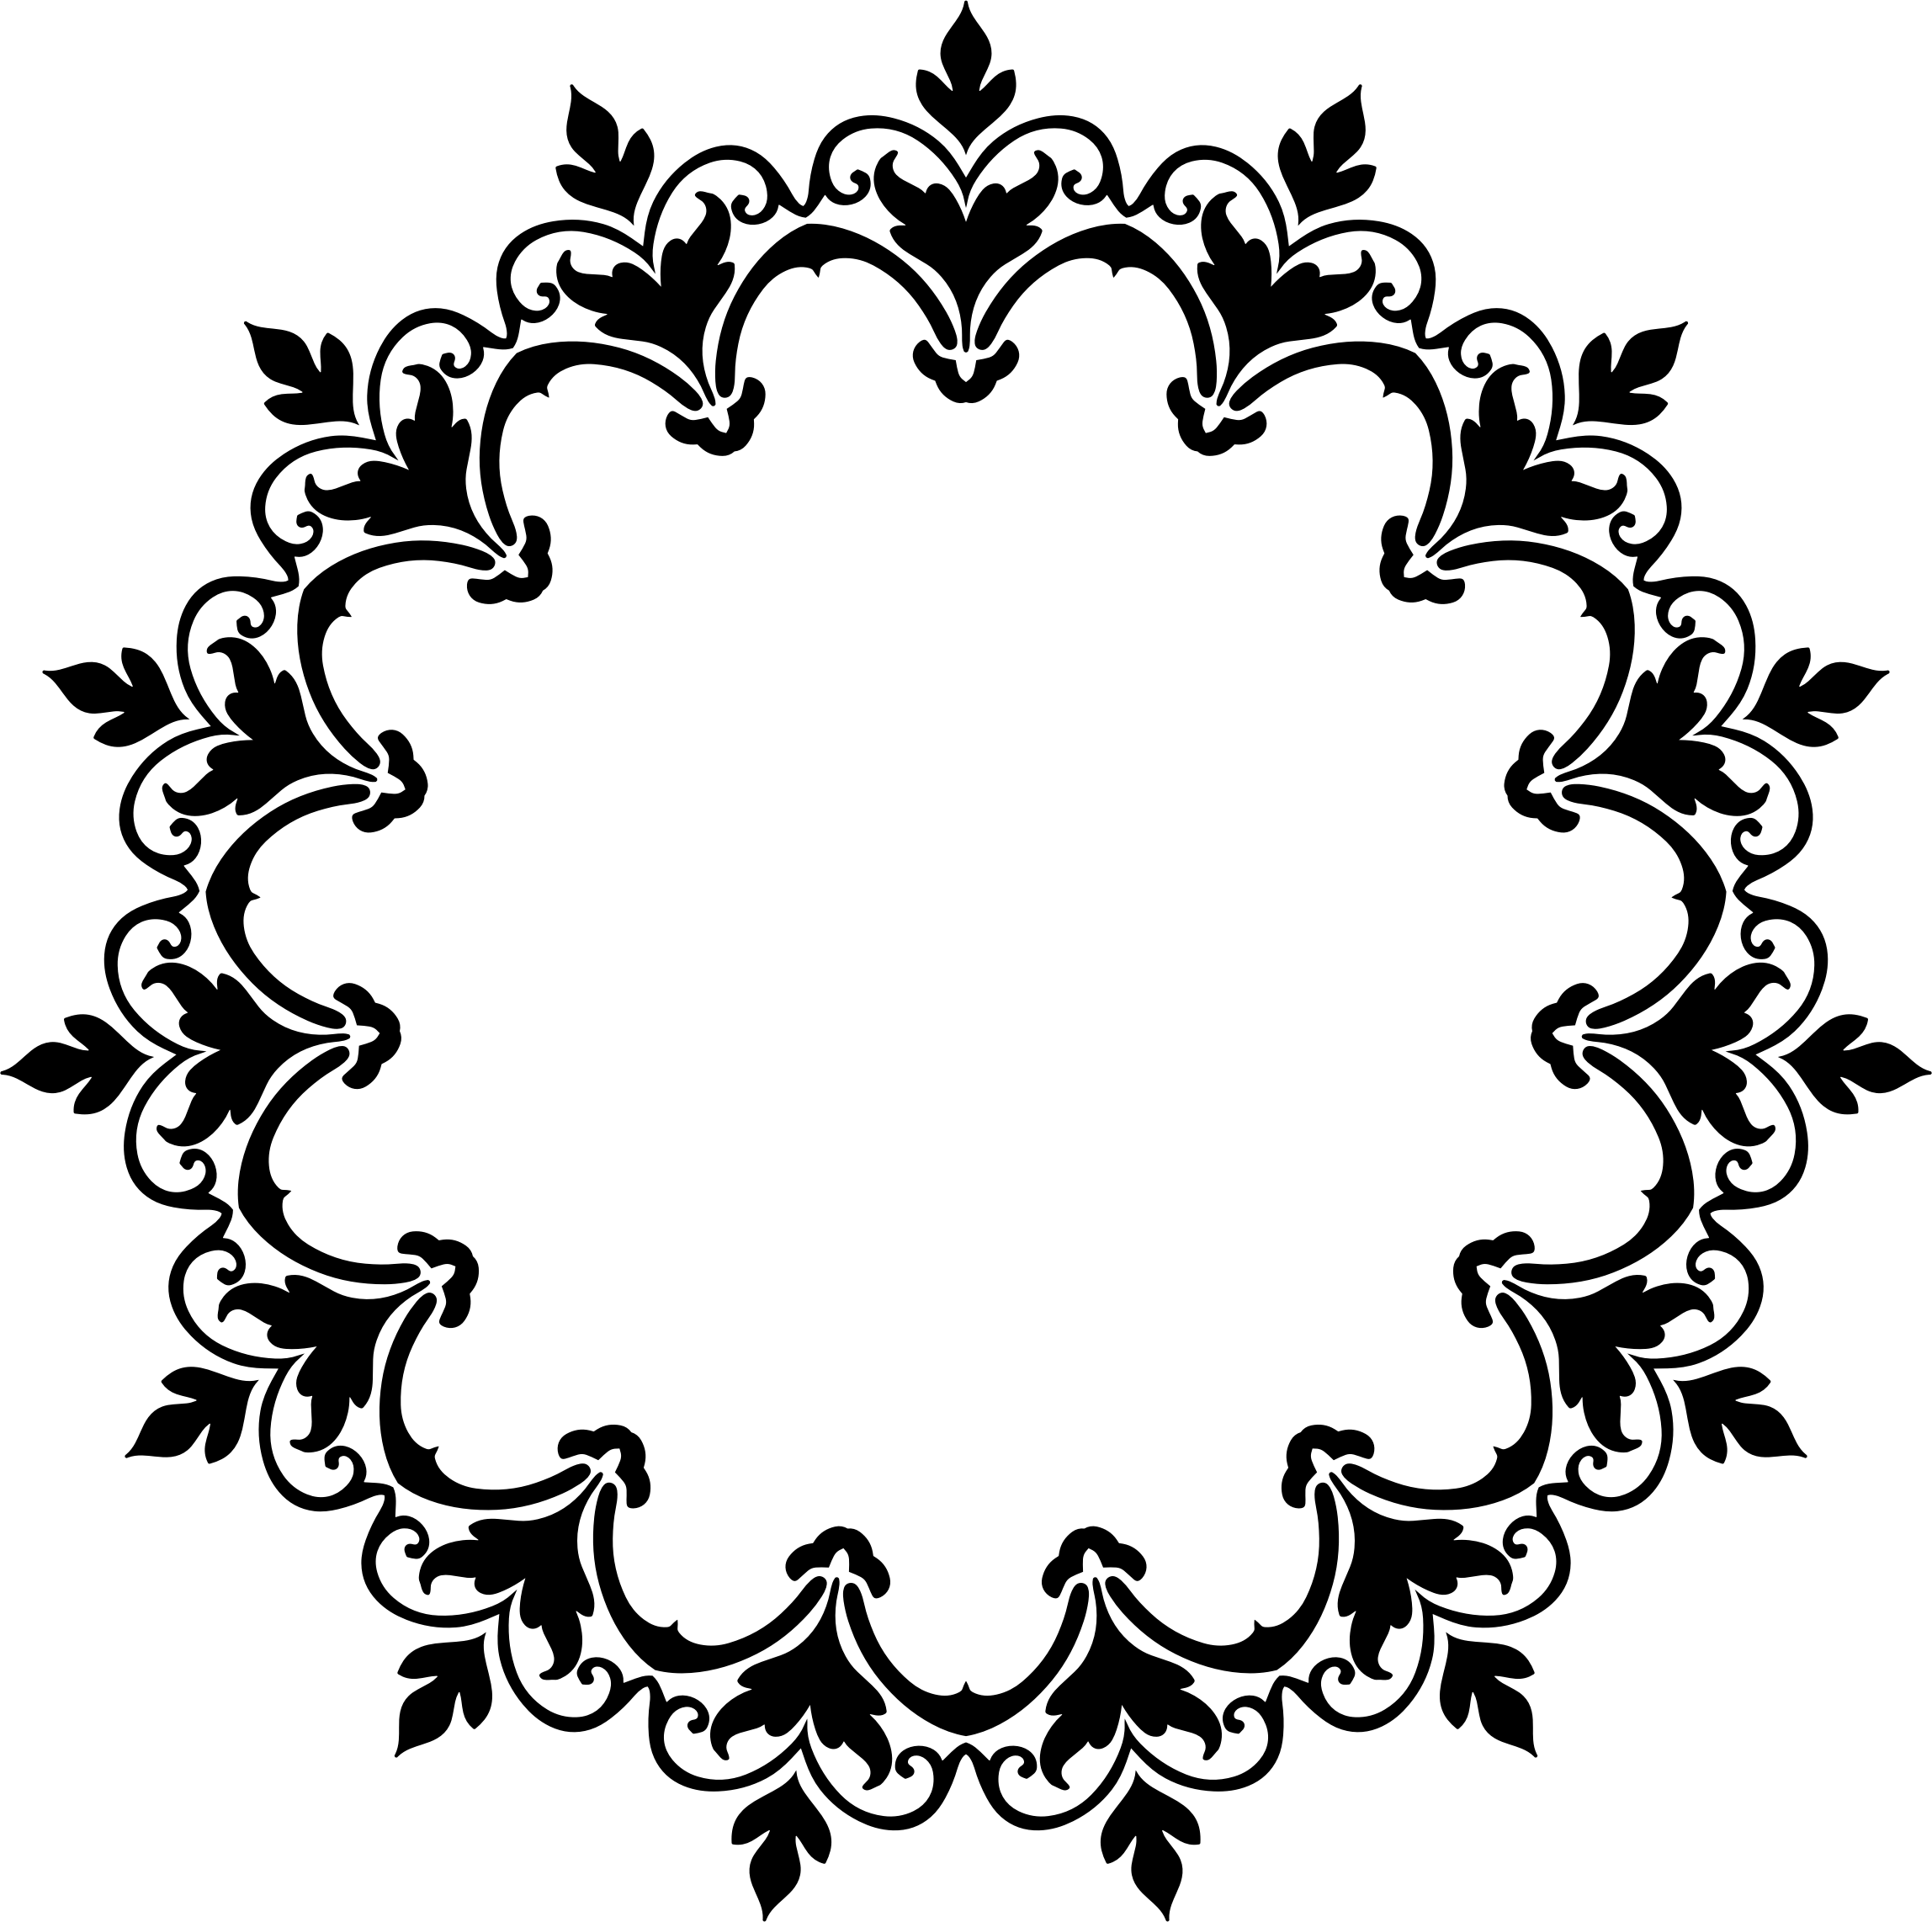 2296x2284 Clipart